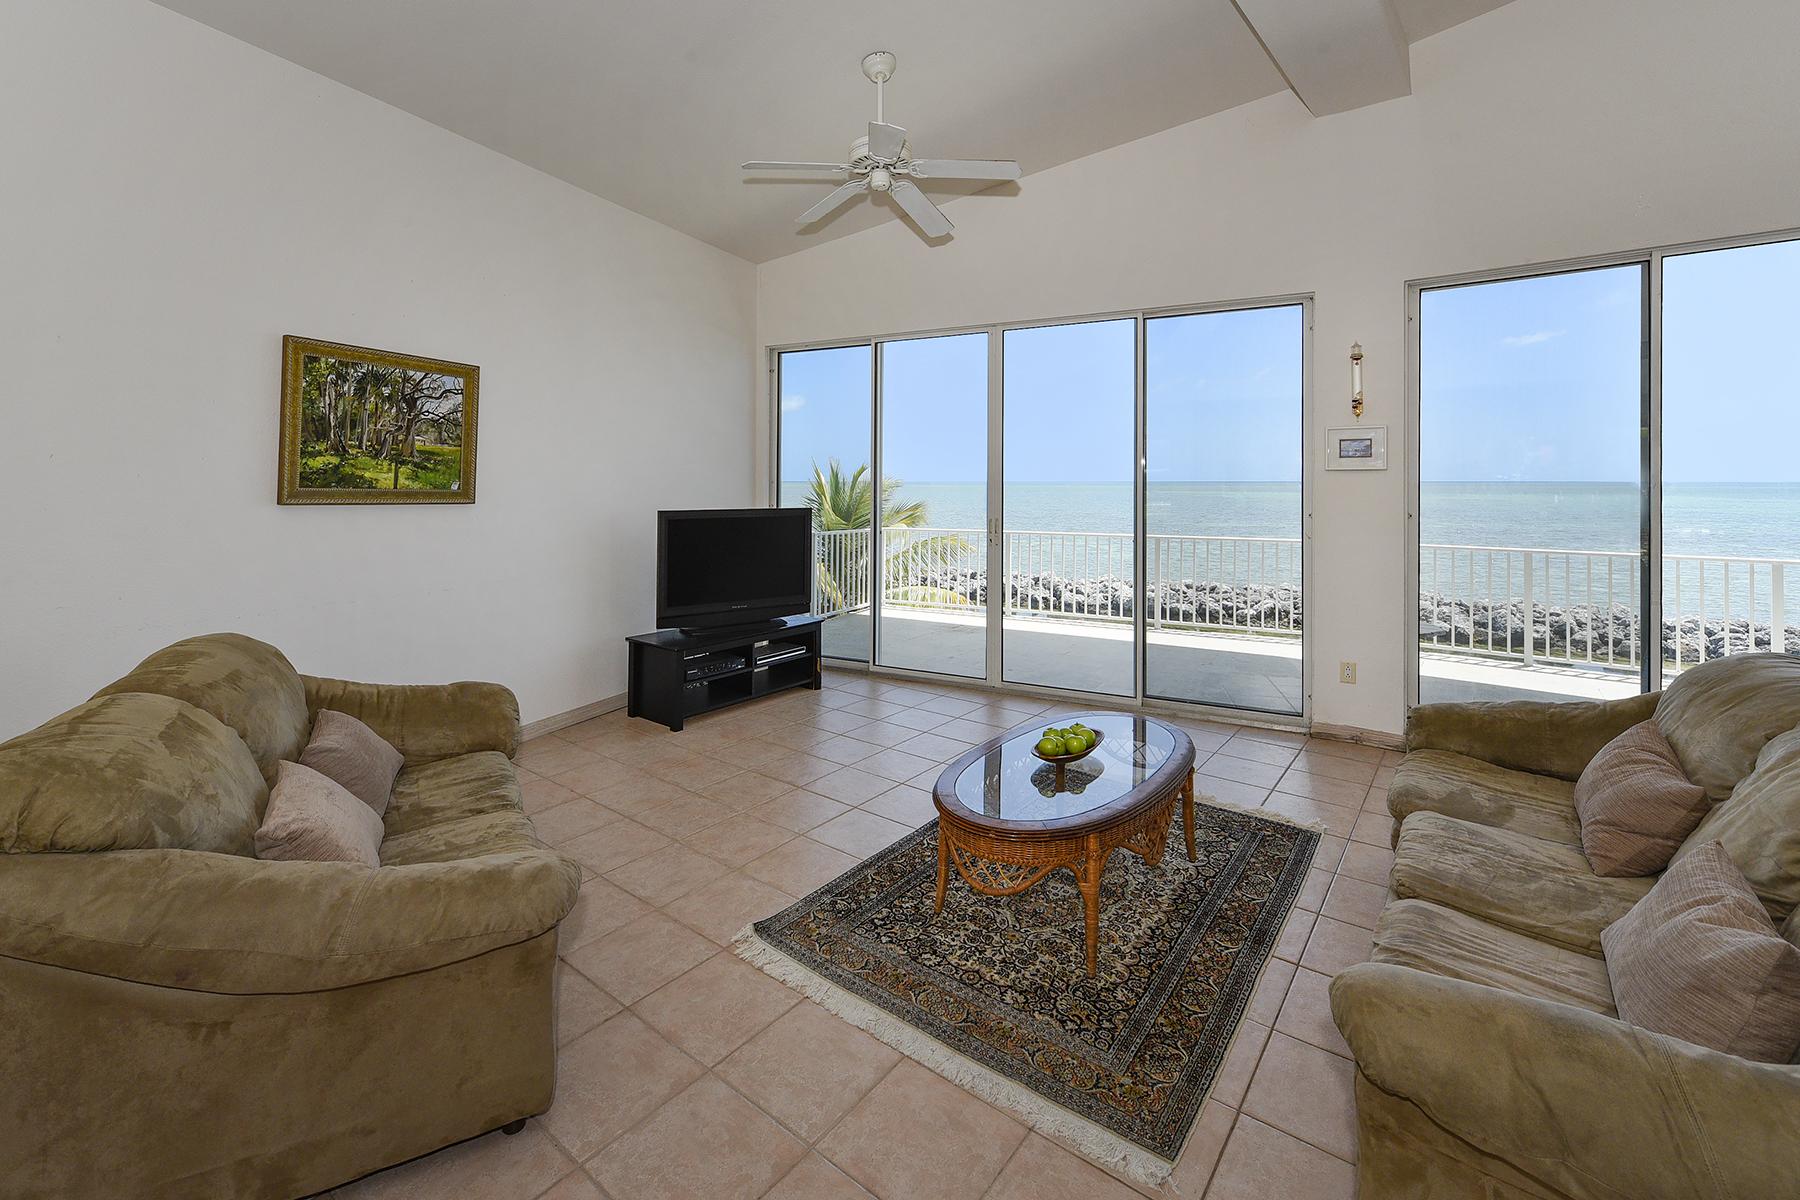 Additional photo for property listing at Sweeping Ocean Views 208 Plantation Shores Drive Islamorada, Florida 33070 Usa